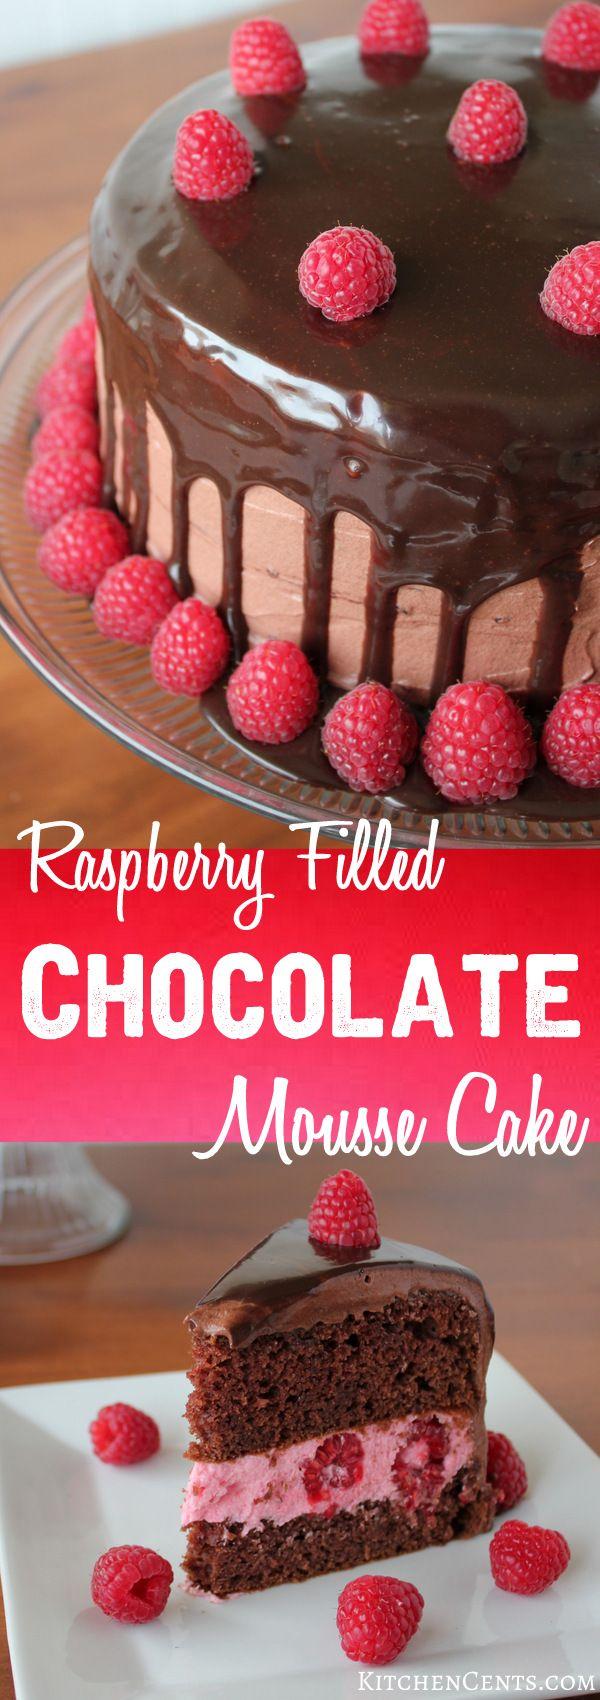 Easy Choc Mousse Cake Recipe